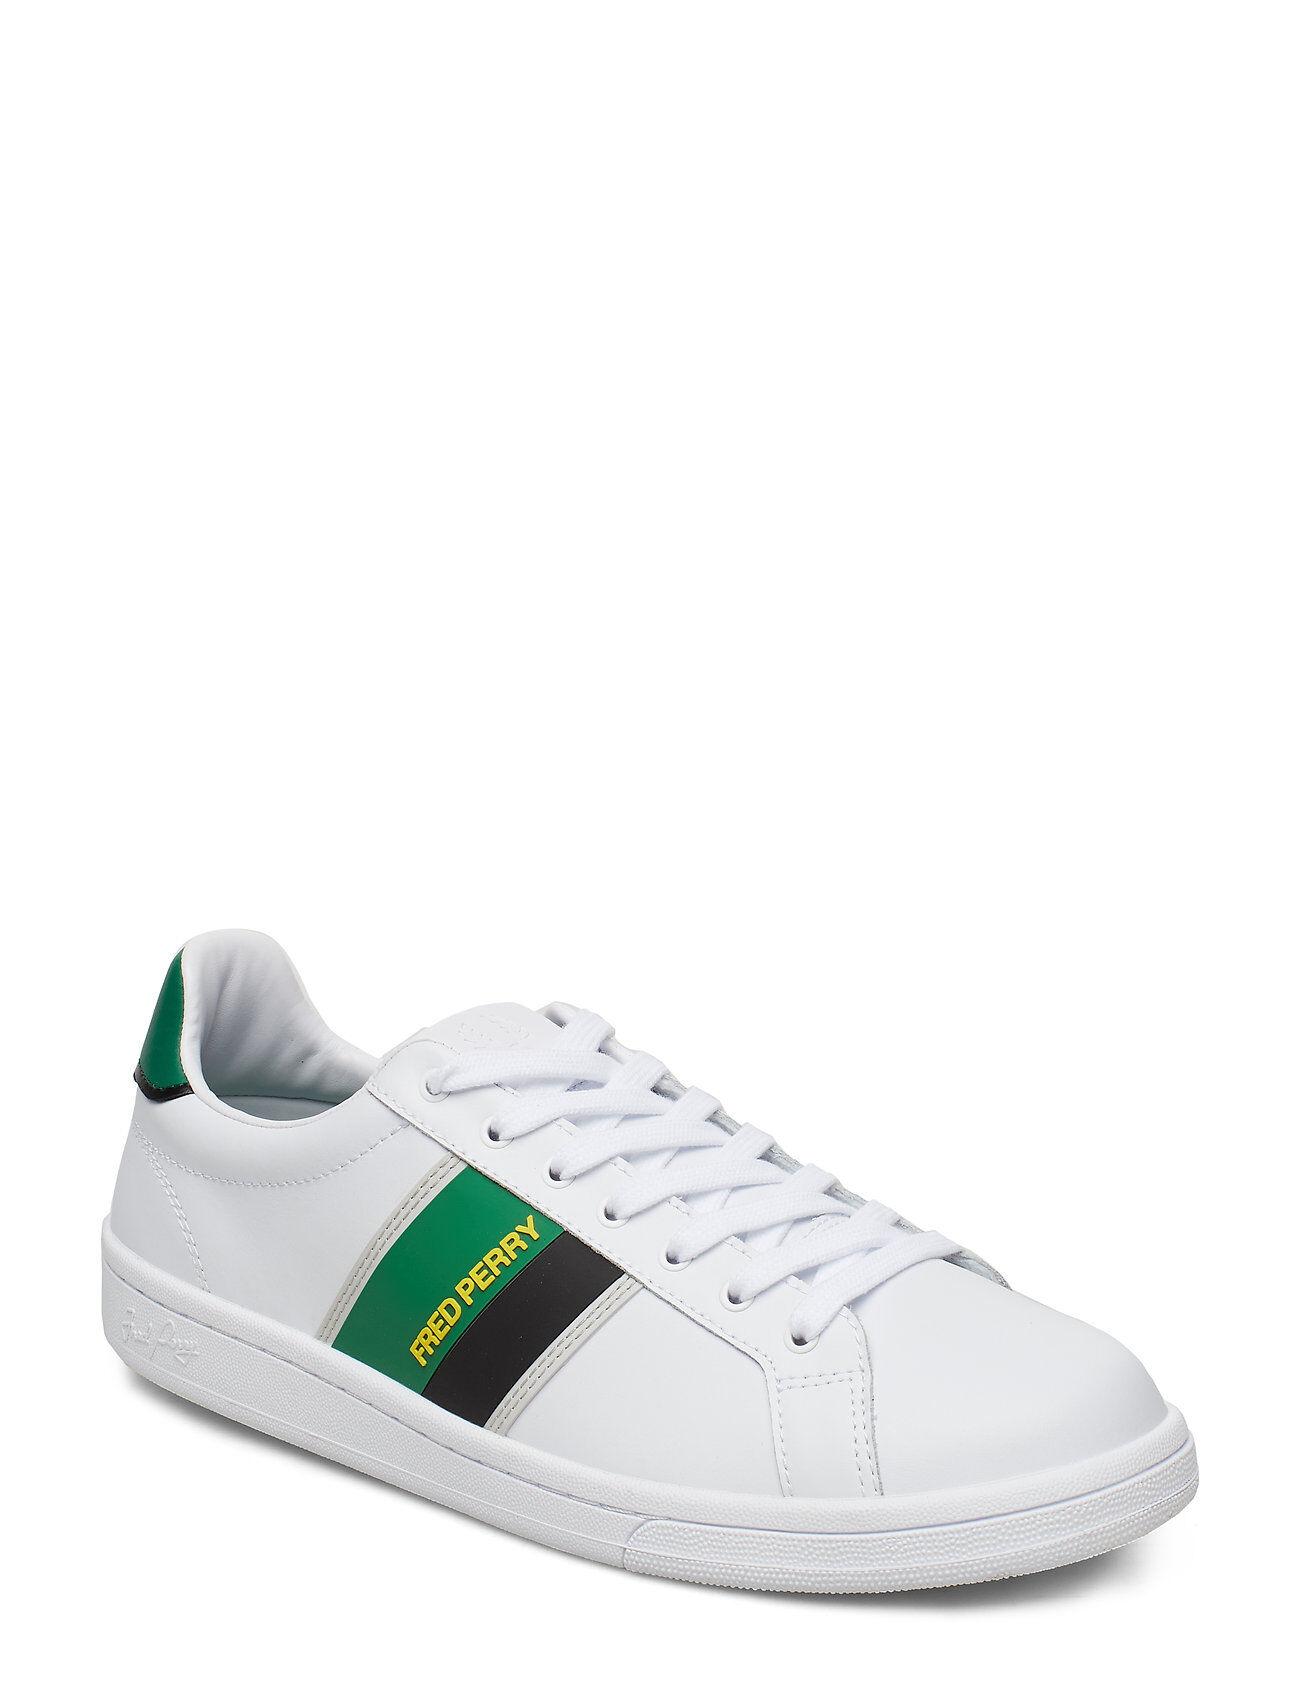 Fred Perry B721 Two T Brand. Matalavartiset Sneakerit Tennarit Valkoinen